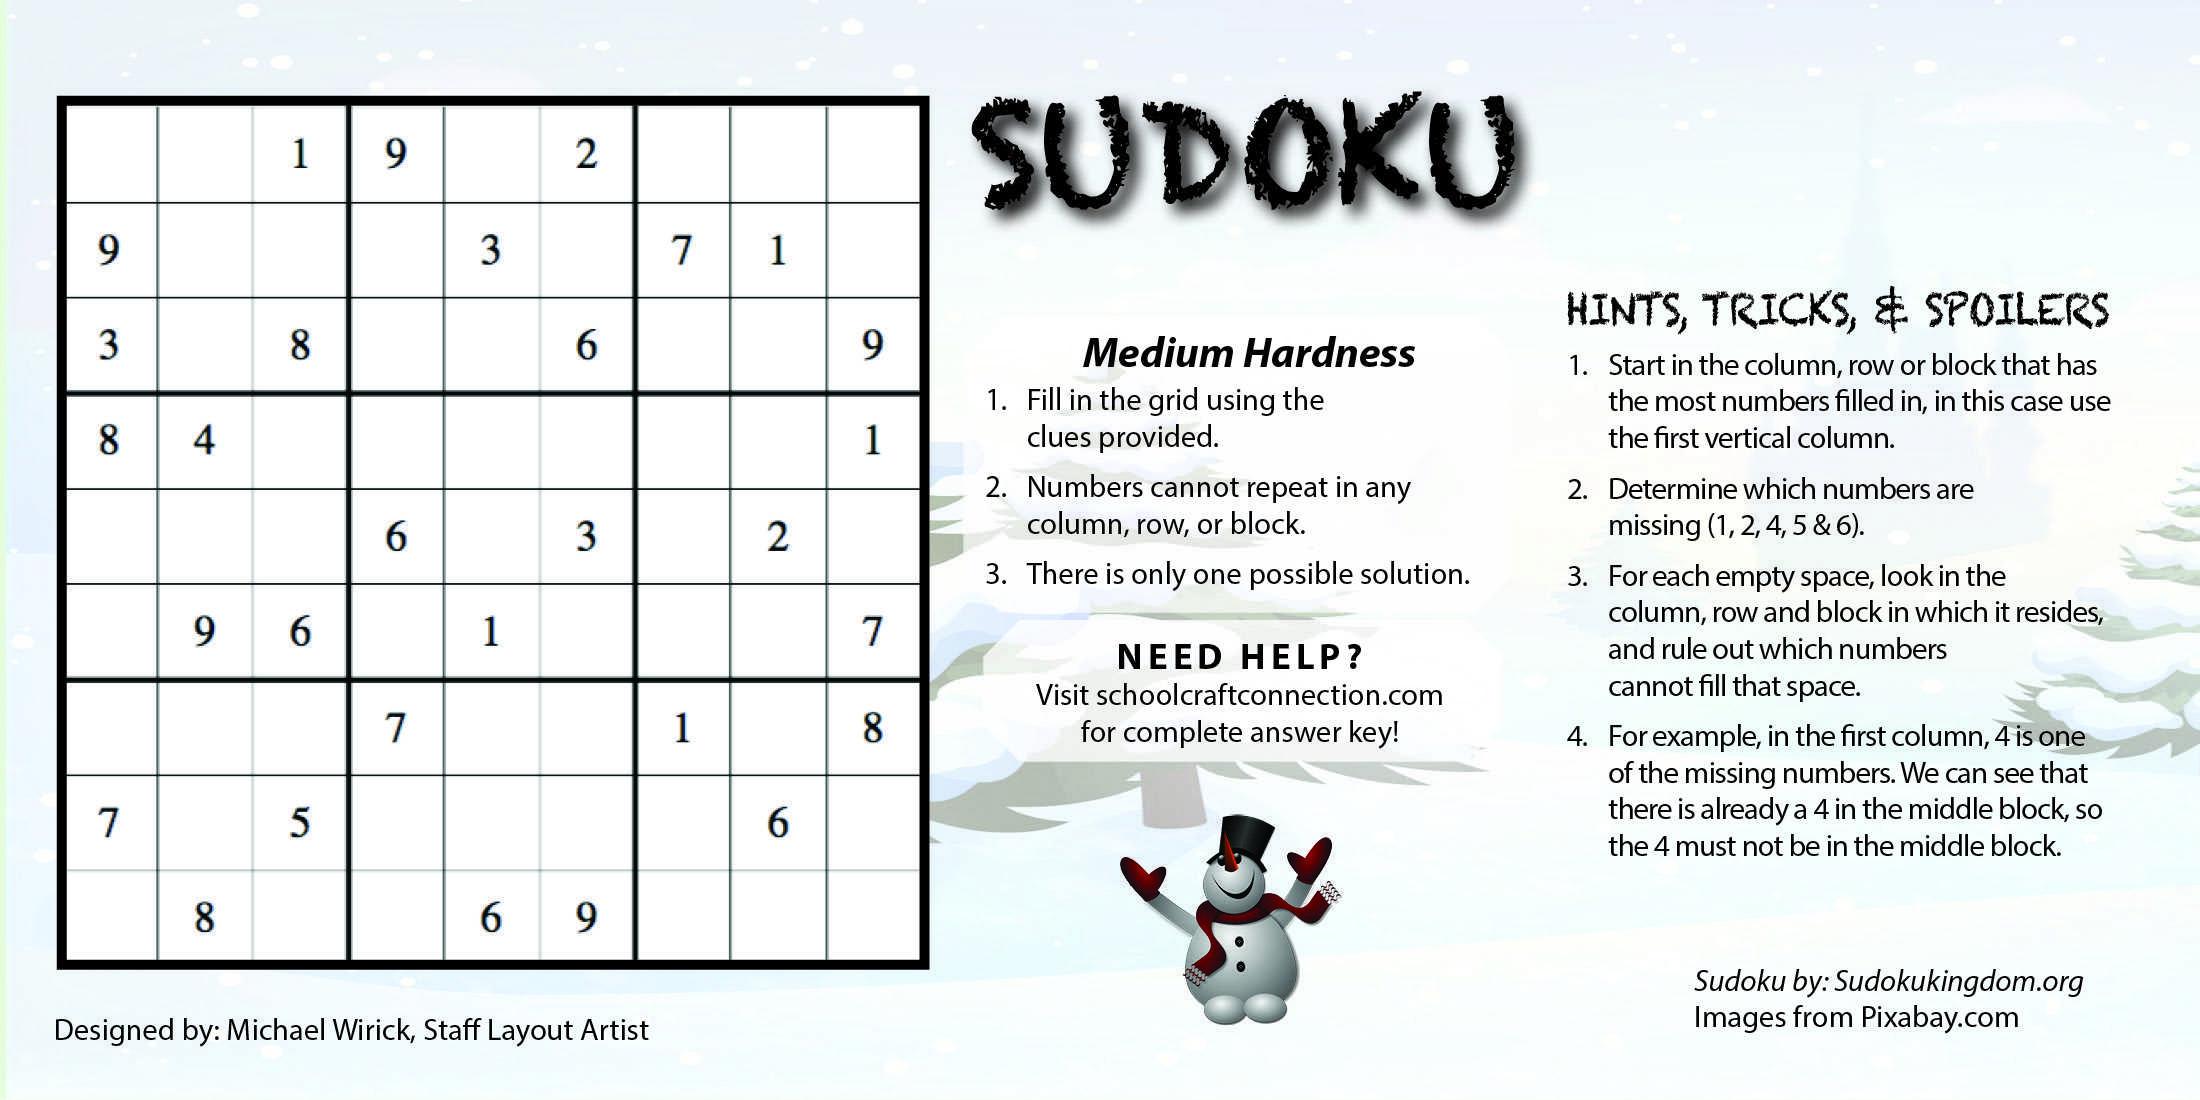 SudokuNewspaperWirick5